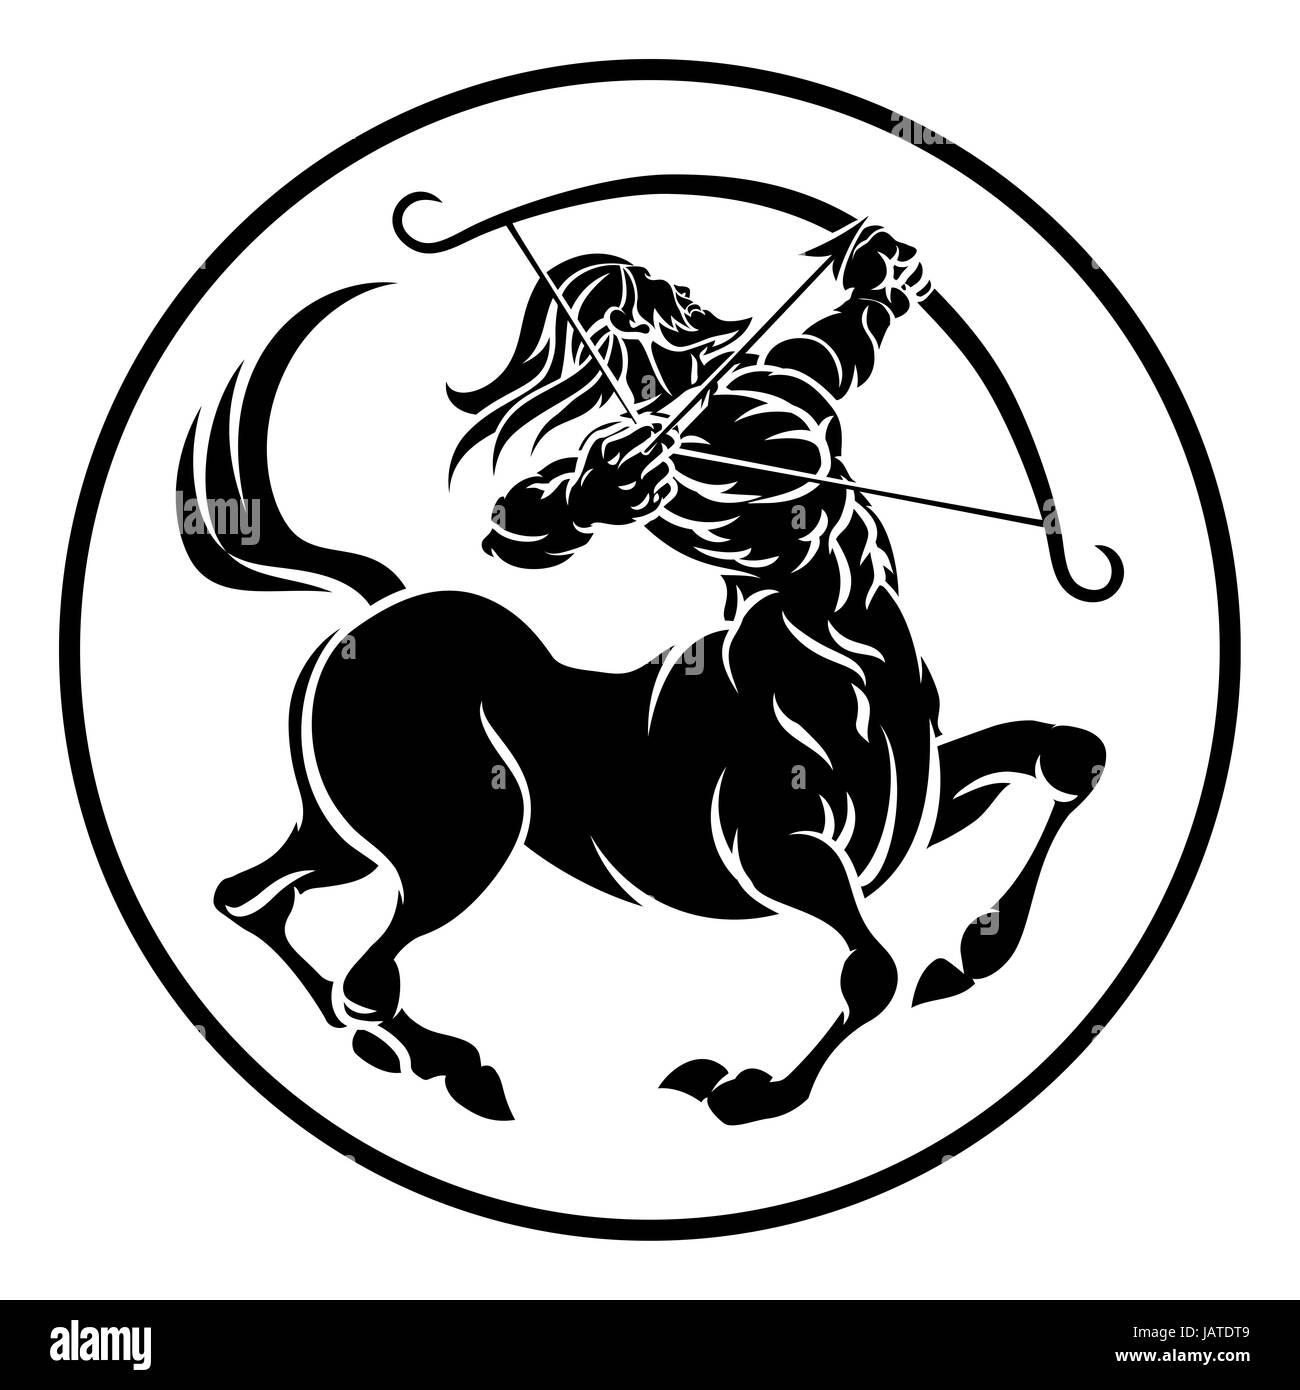 circle sagittarius archer centaur horoscope astrology zodiac sign